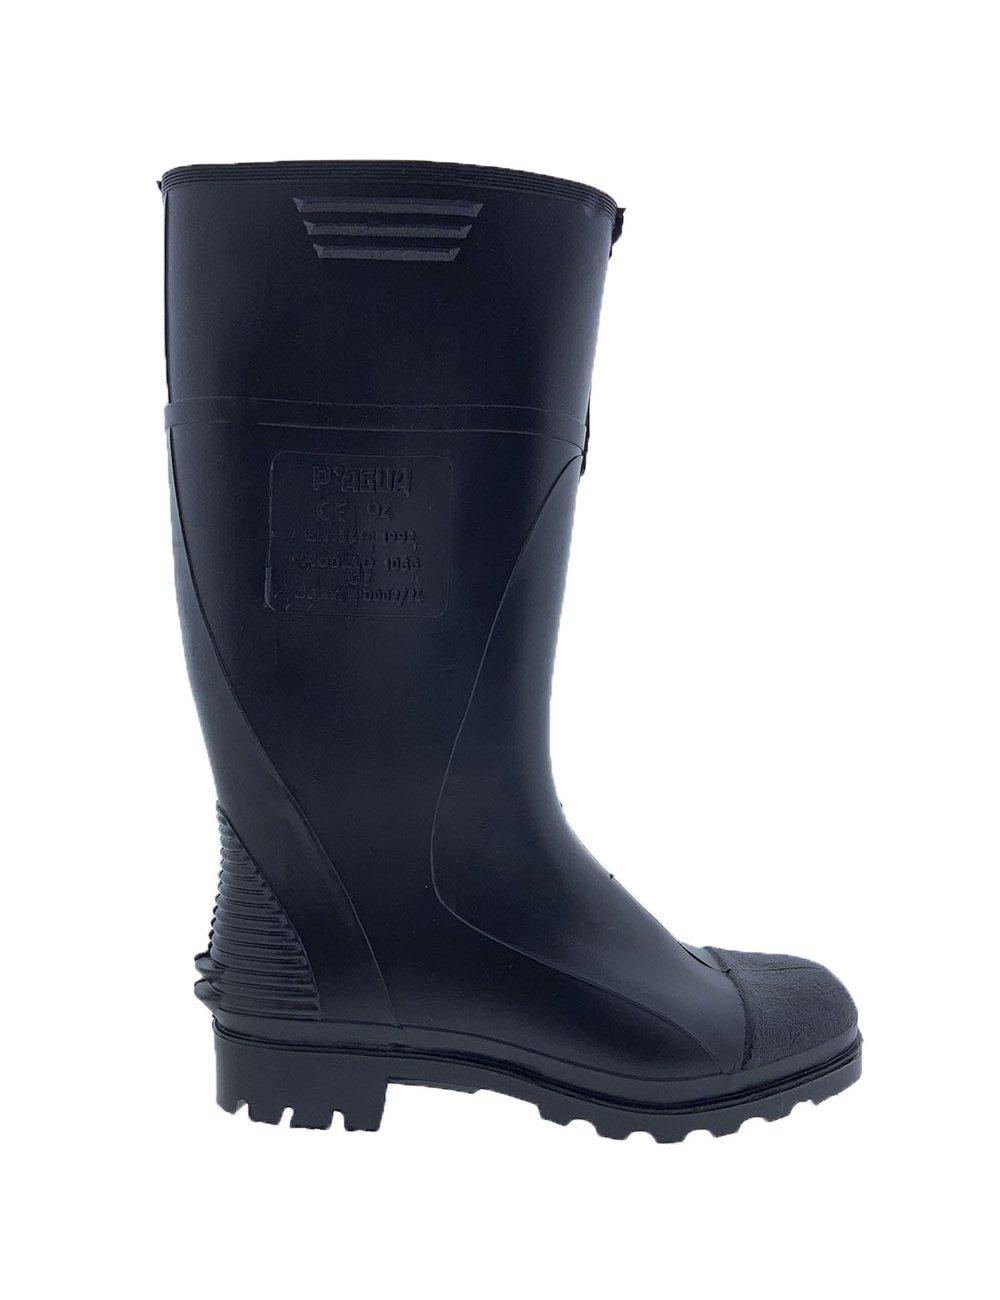 Botas De Agua P'Agua 1066 Negro